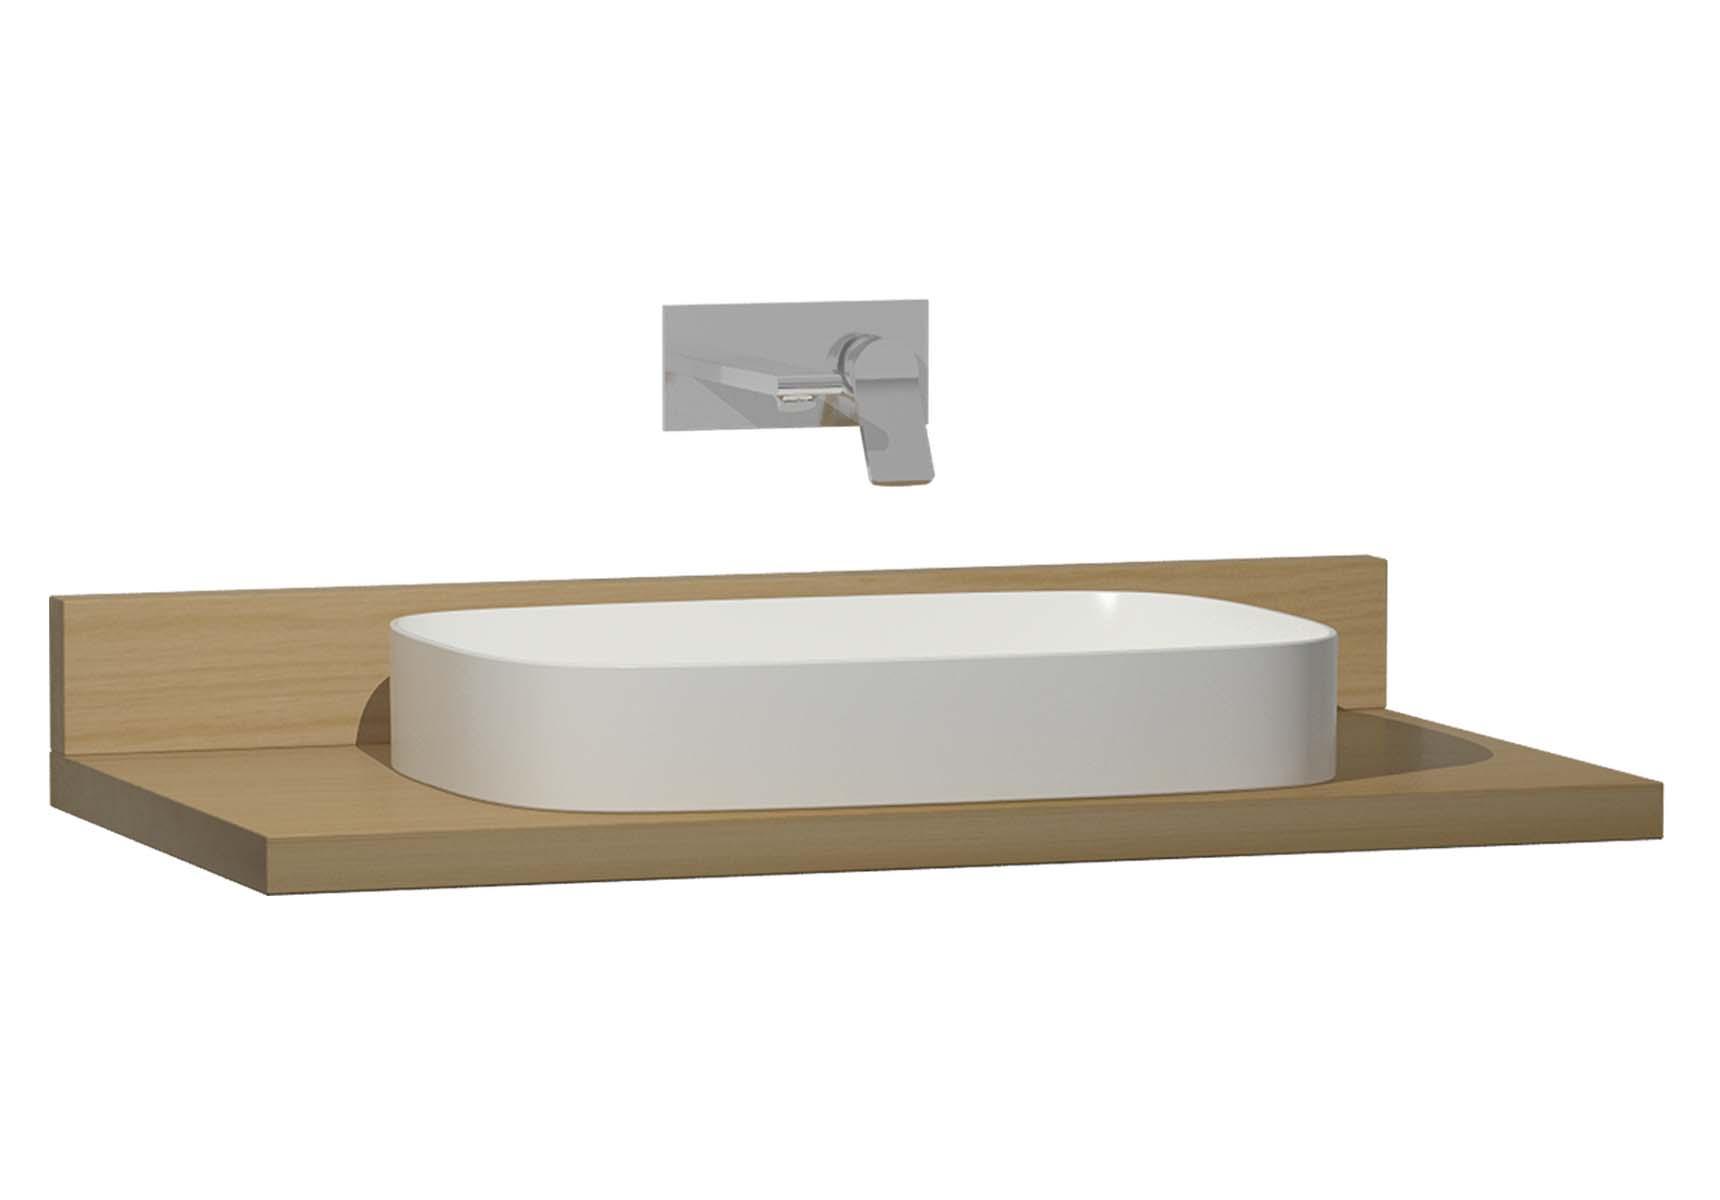 Memoria Black Counter, 100 cm, Patterned Oak, Washbasin Matte White